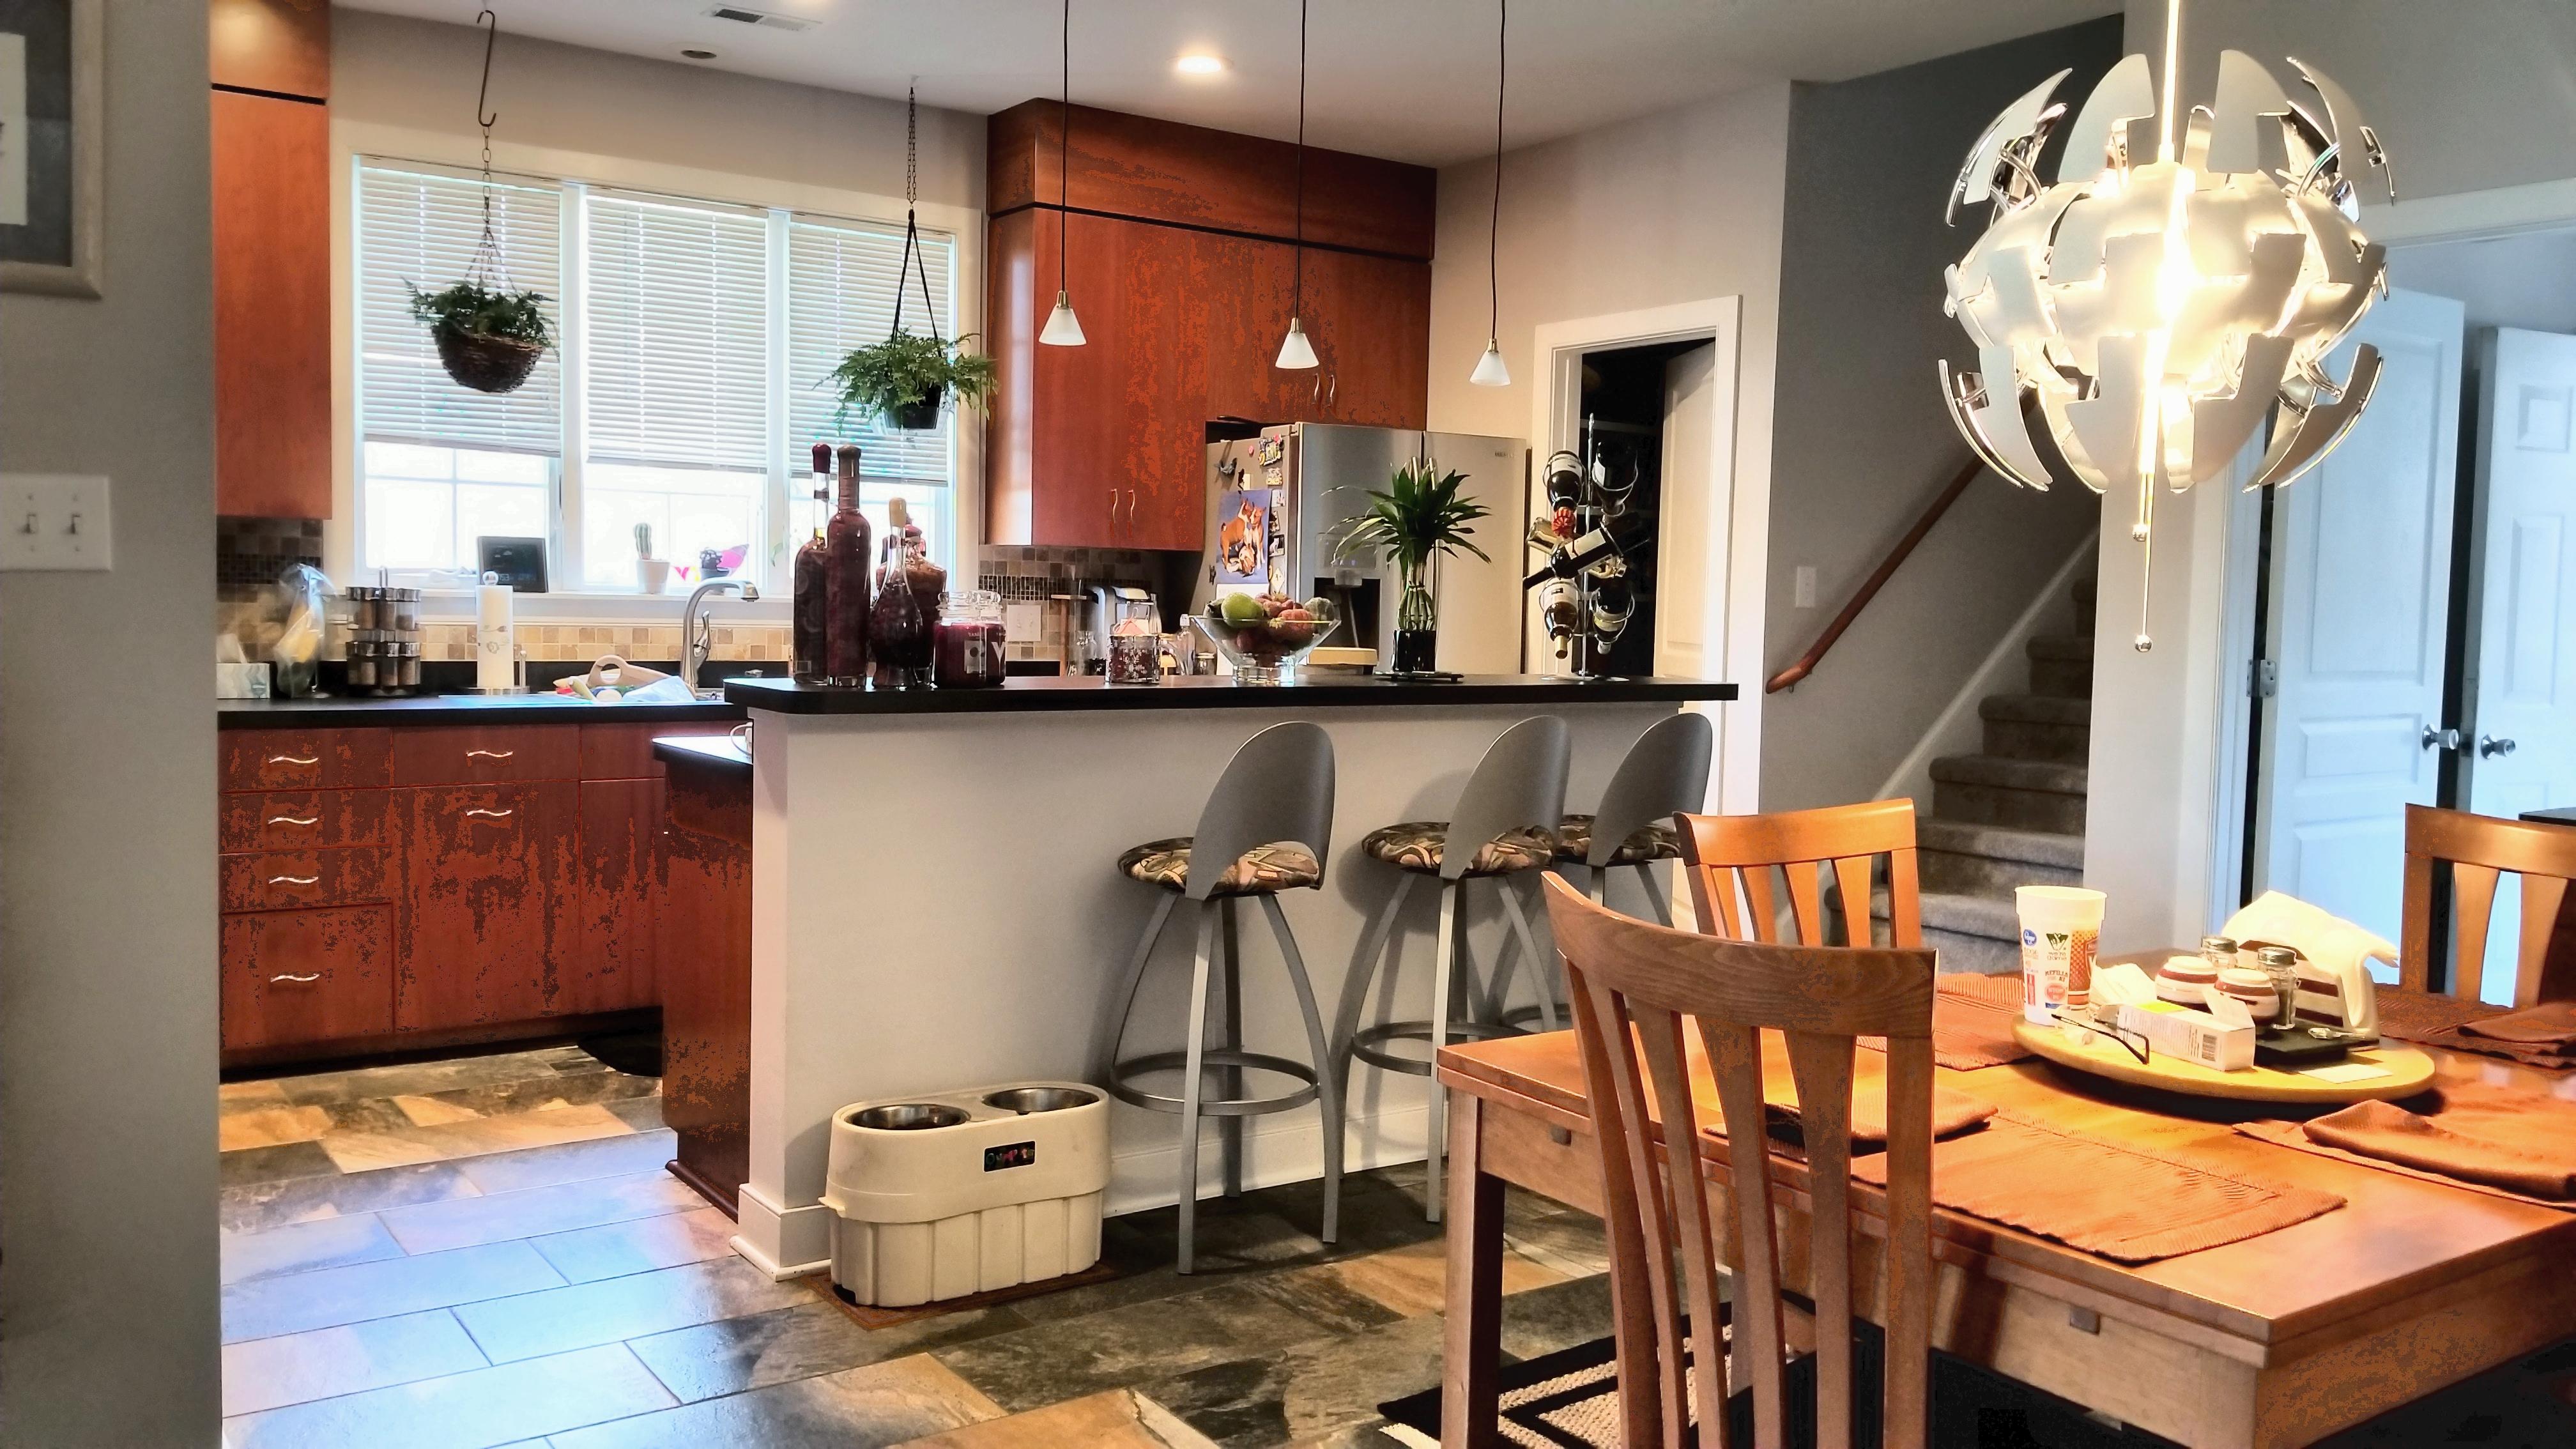 House Plan 137 - Oak Park